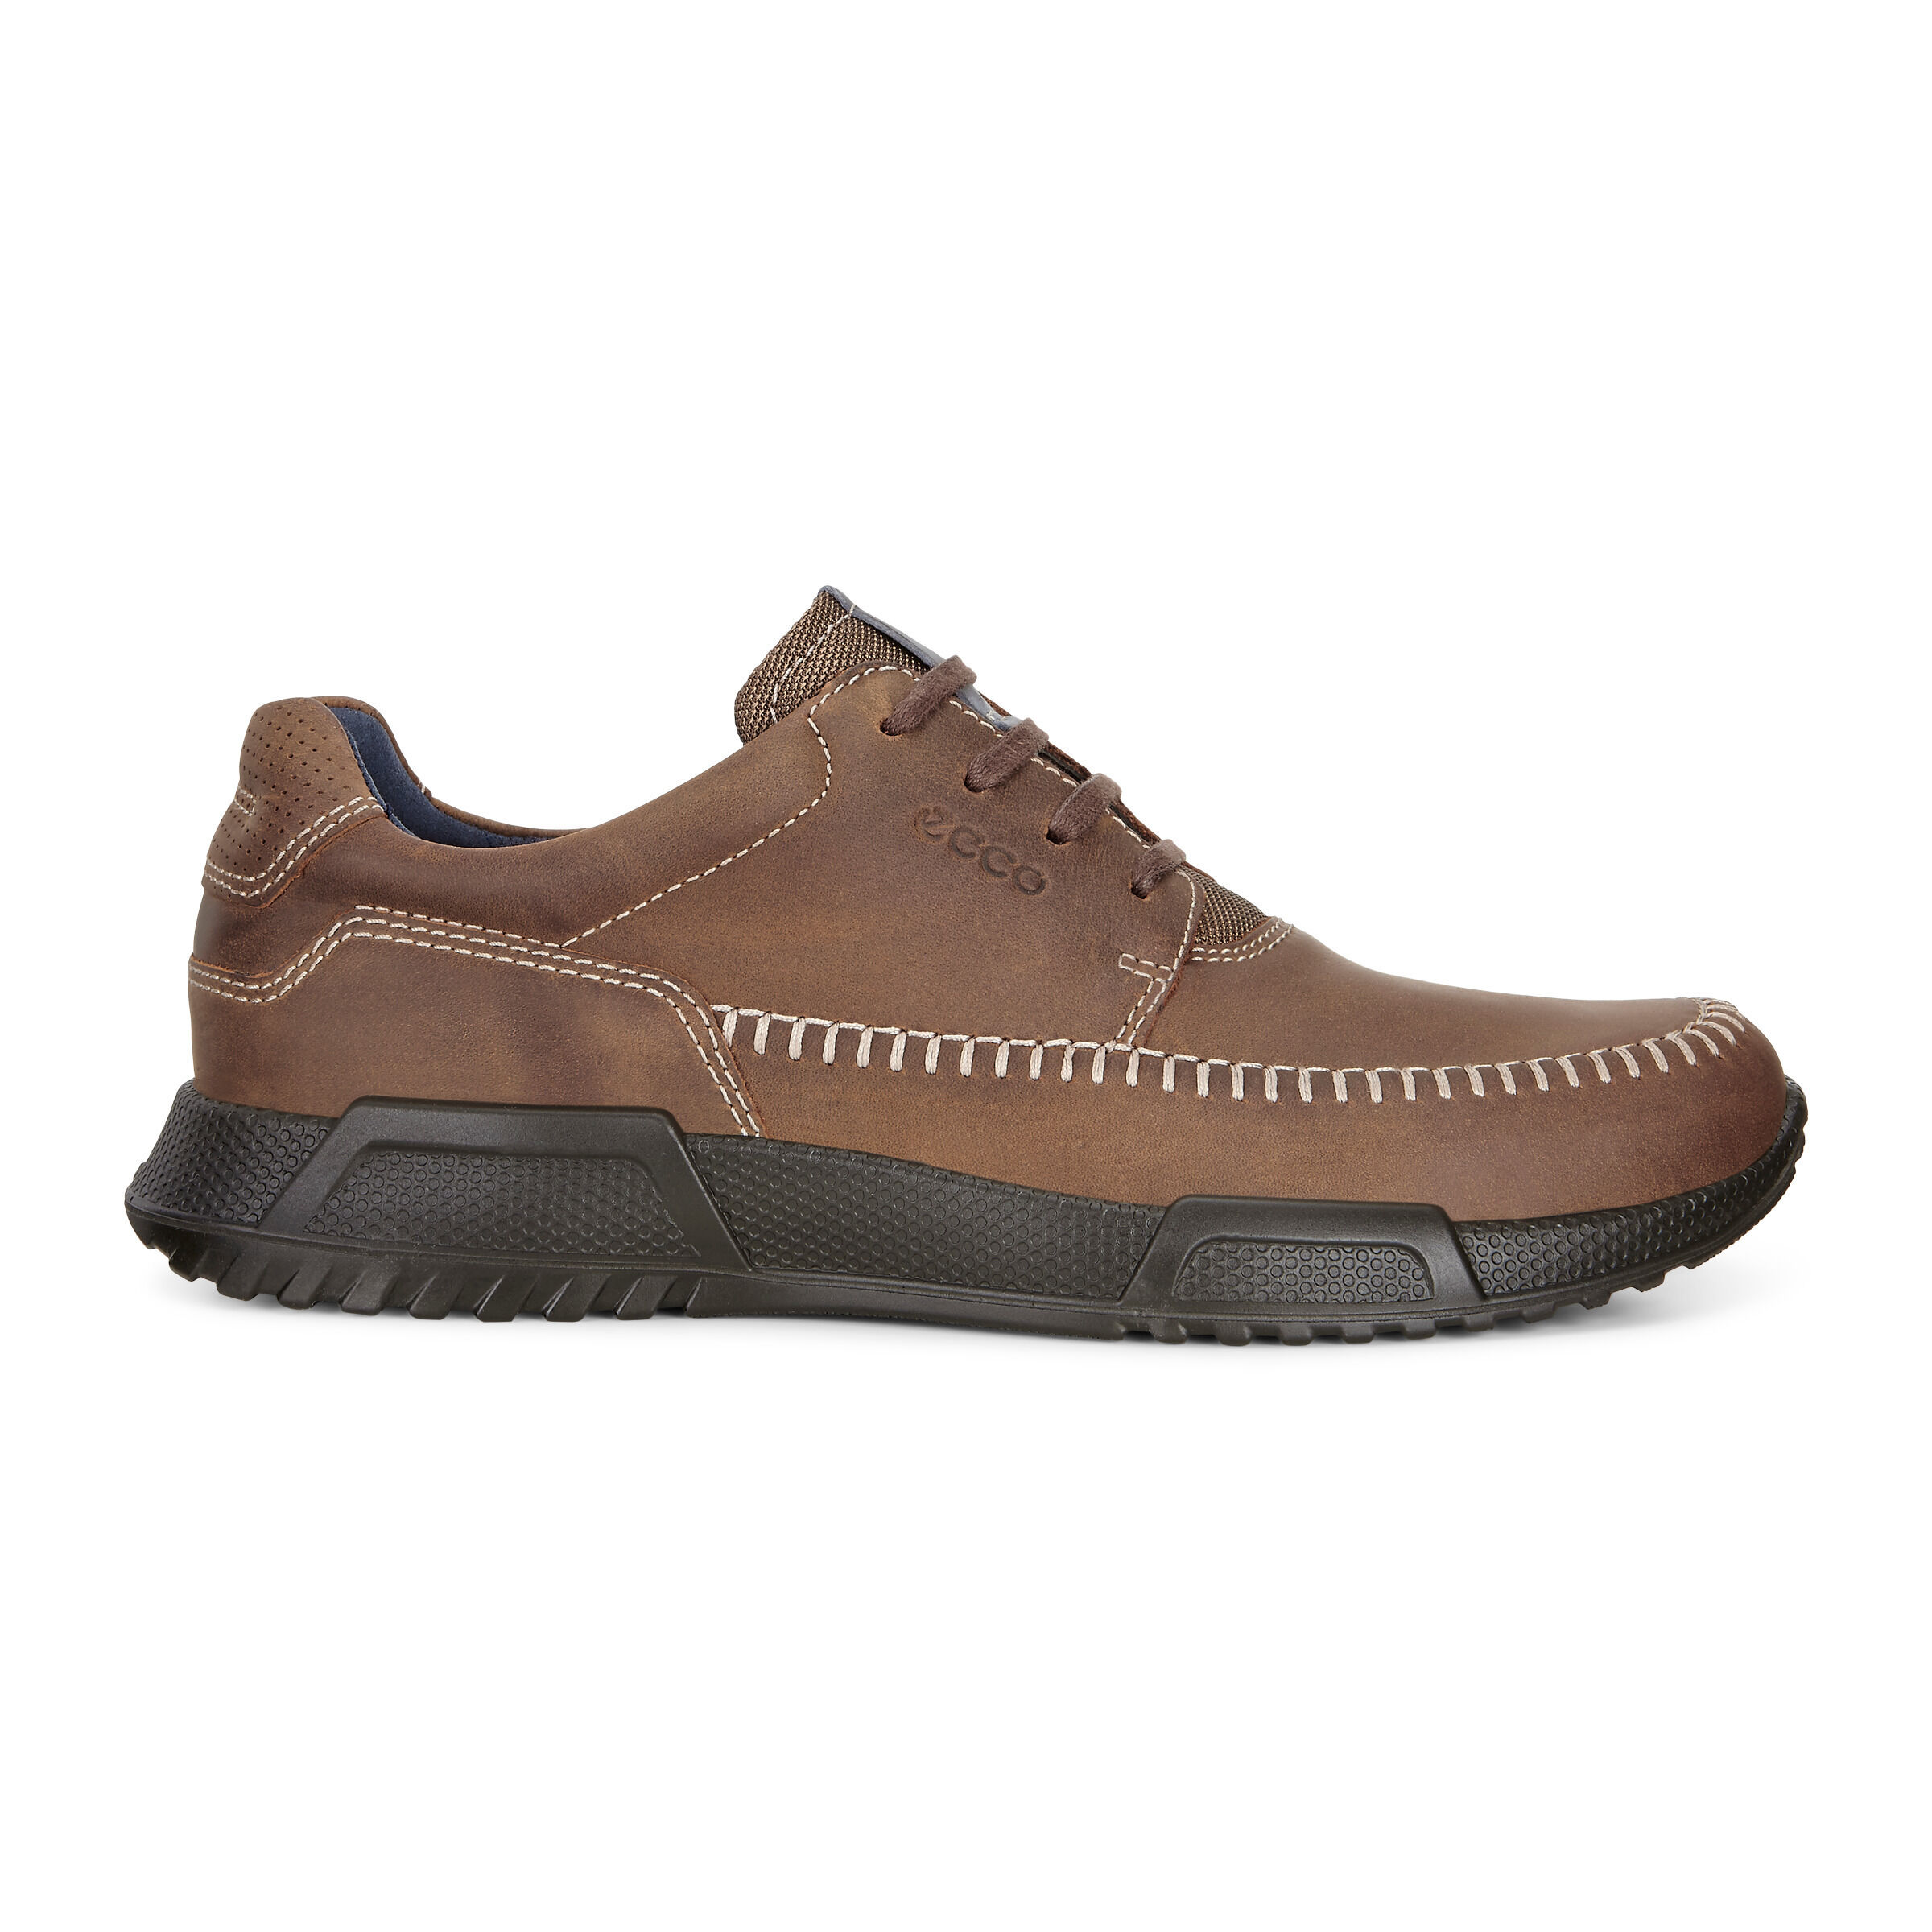 ECCO LUCA Mens Nubuck Leather Casual Lightweight Slip On Comfort Shoes Black